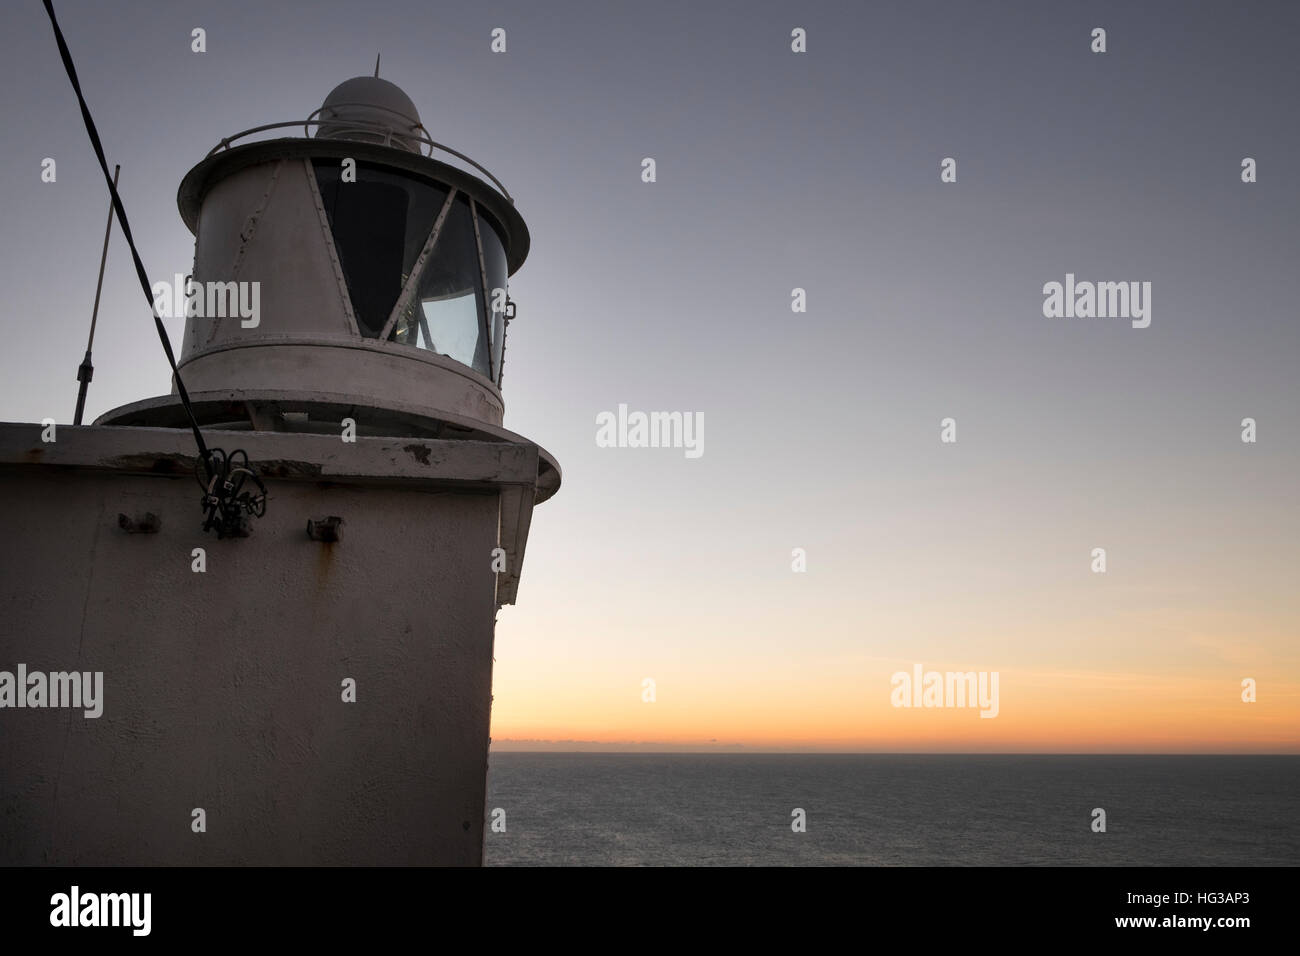 The lighthouse at sunset on the Sheeps Head Peninsula County Cork Ireland - Stock Image